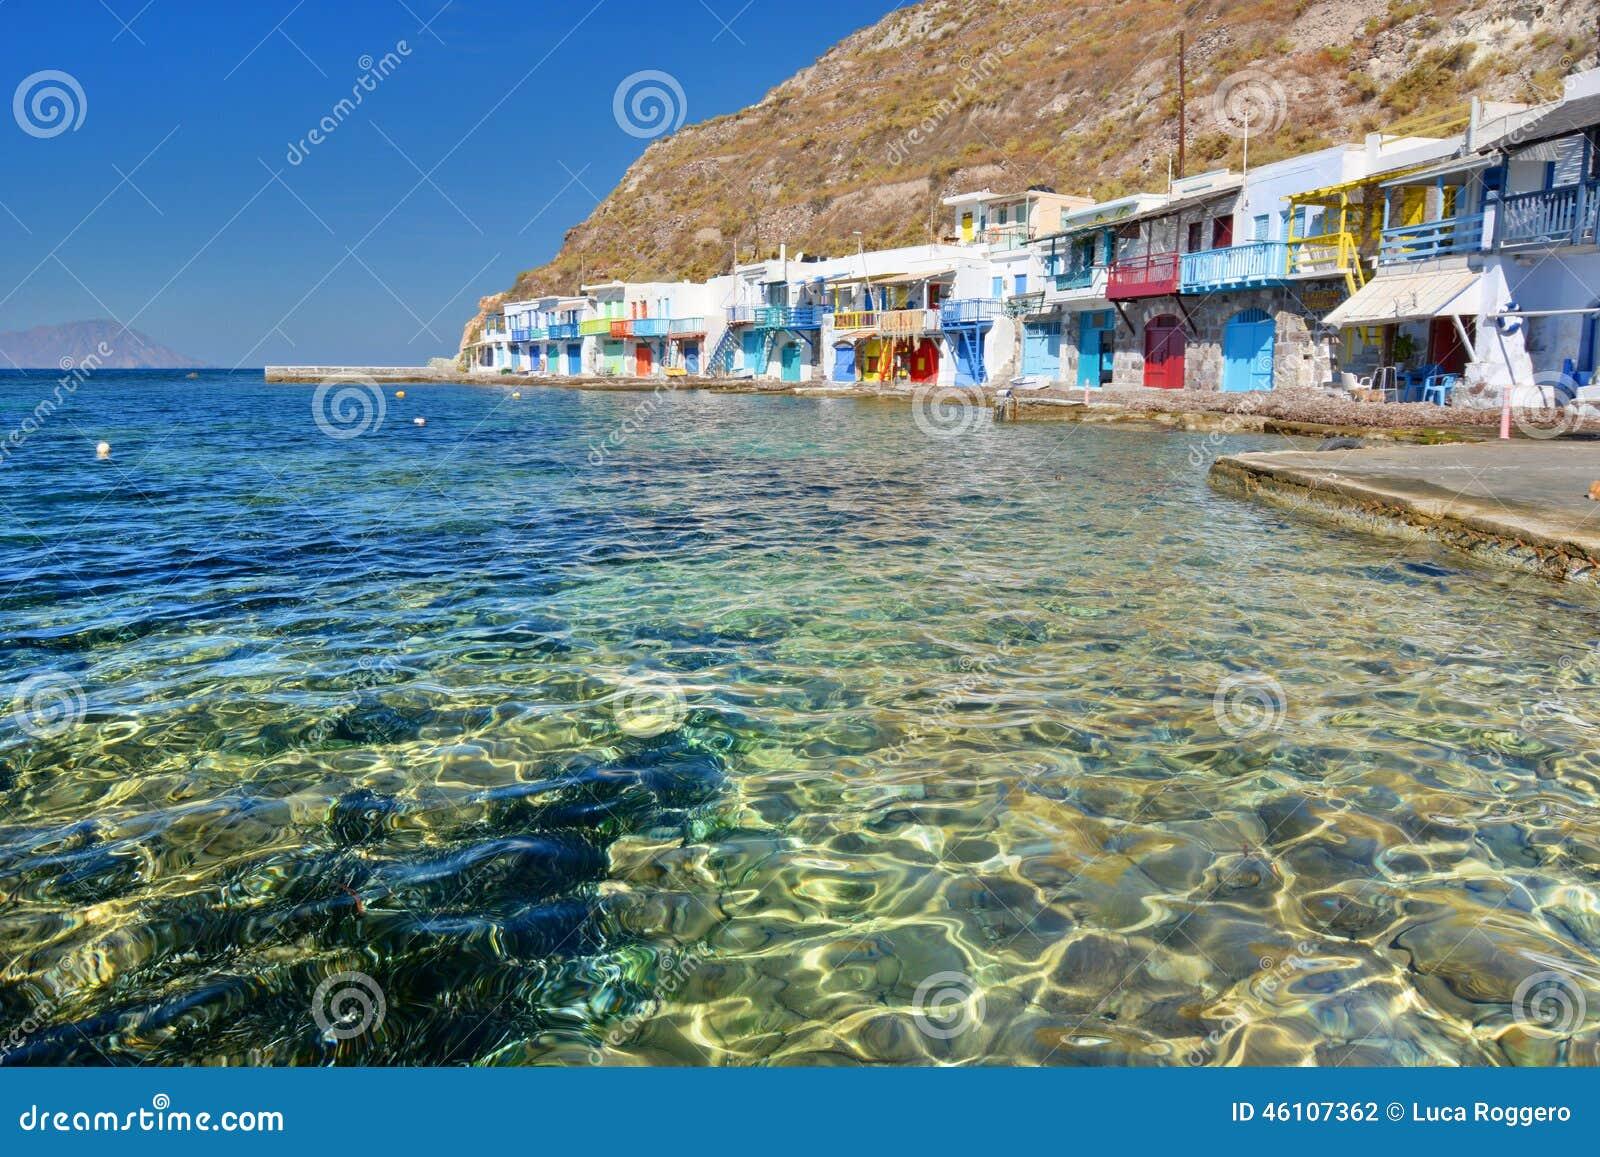 Traditional Fishing Village. Klima, Milos. Cyclades ...